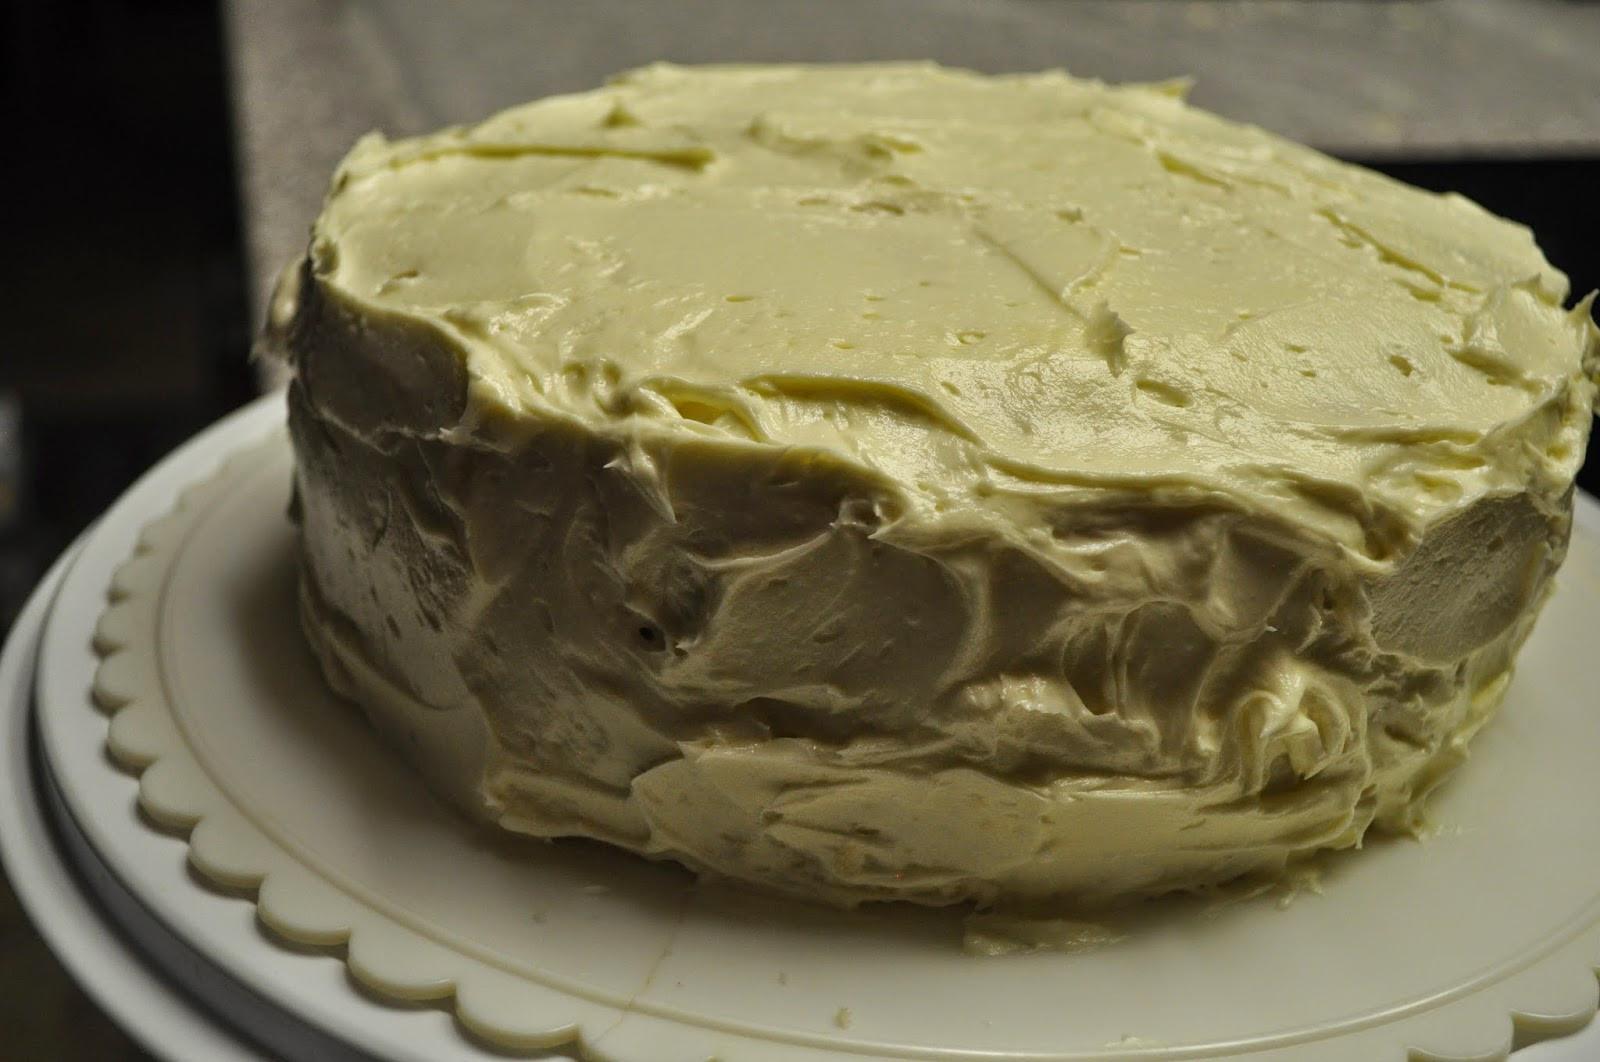 White Almond Wedding Cake Recipe  Beth s Favorite Recipes White Almond Wedding Cake with